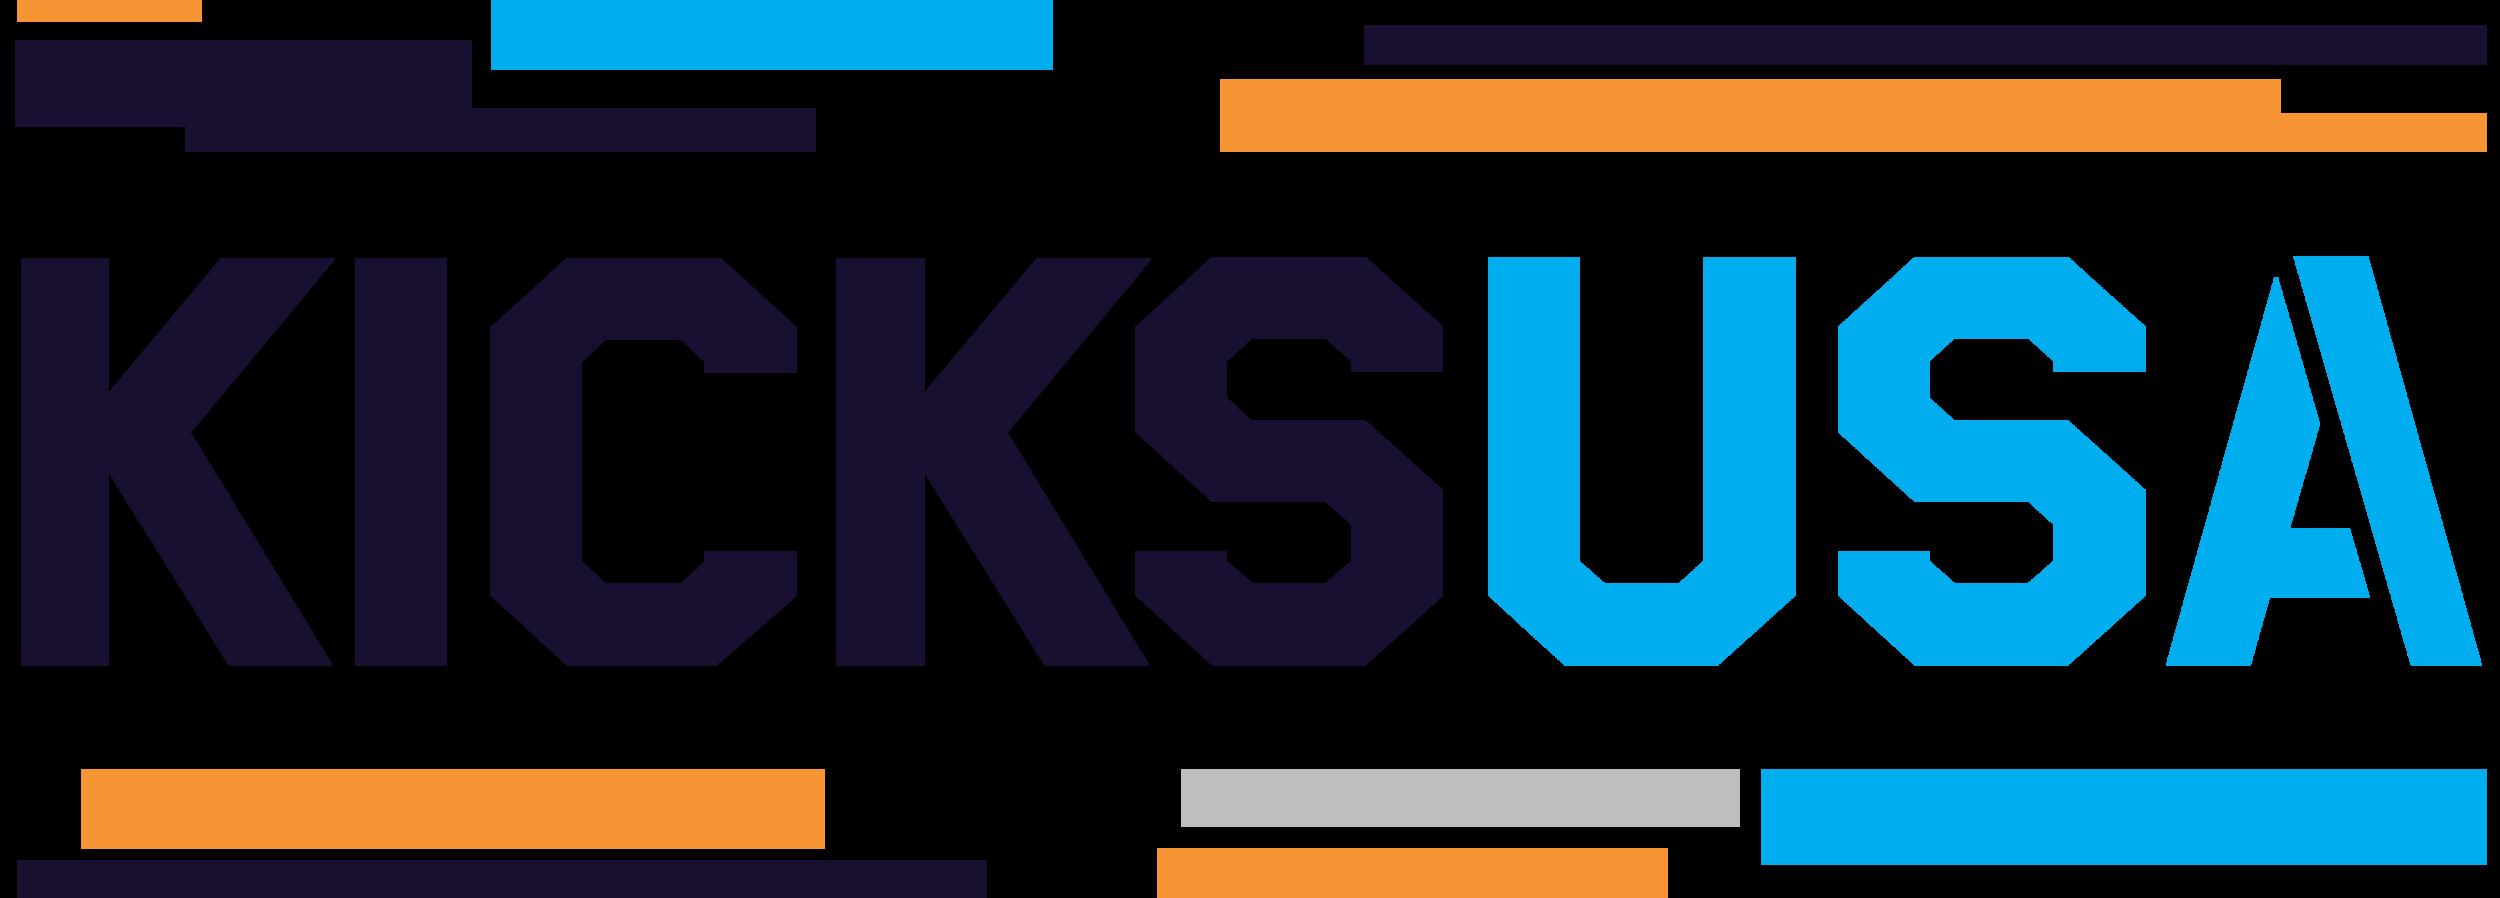 KicksUSA.png